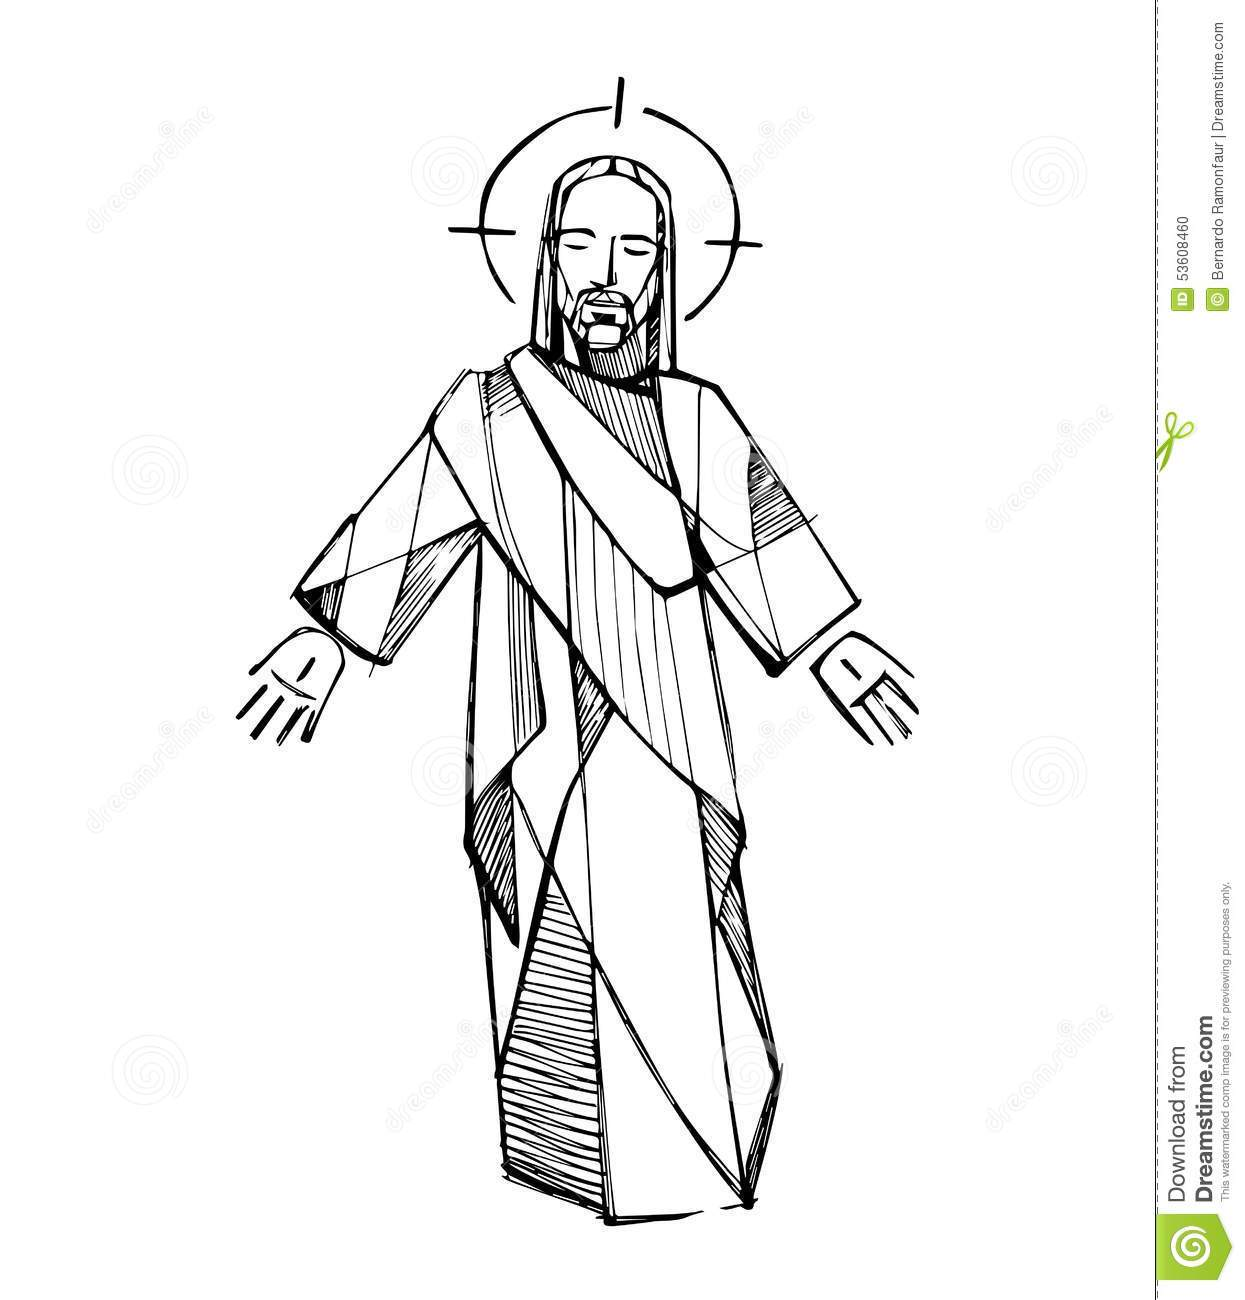 Risen christ clipart png free stock Risen christ clipart 3 » Clipart Portal png free stock